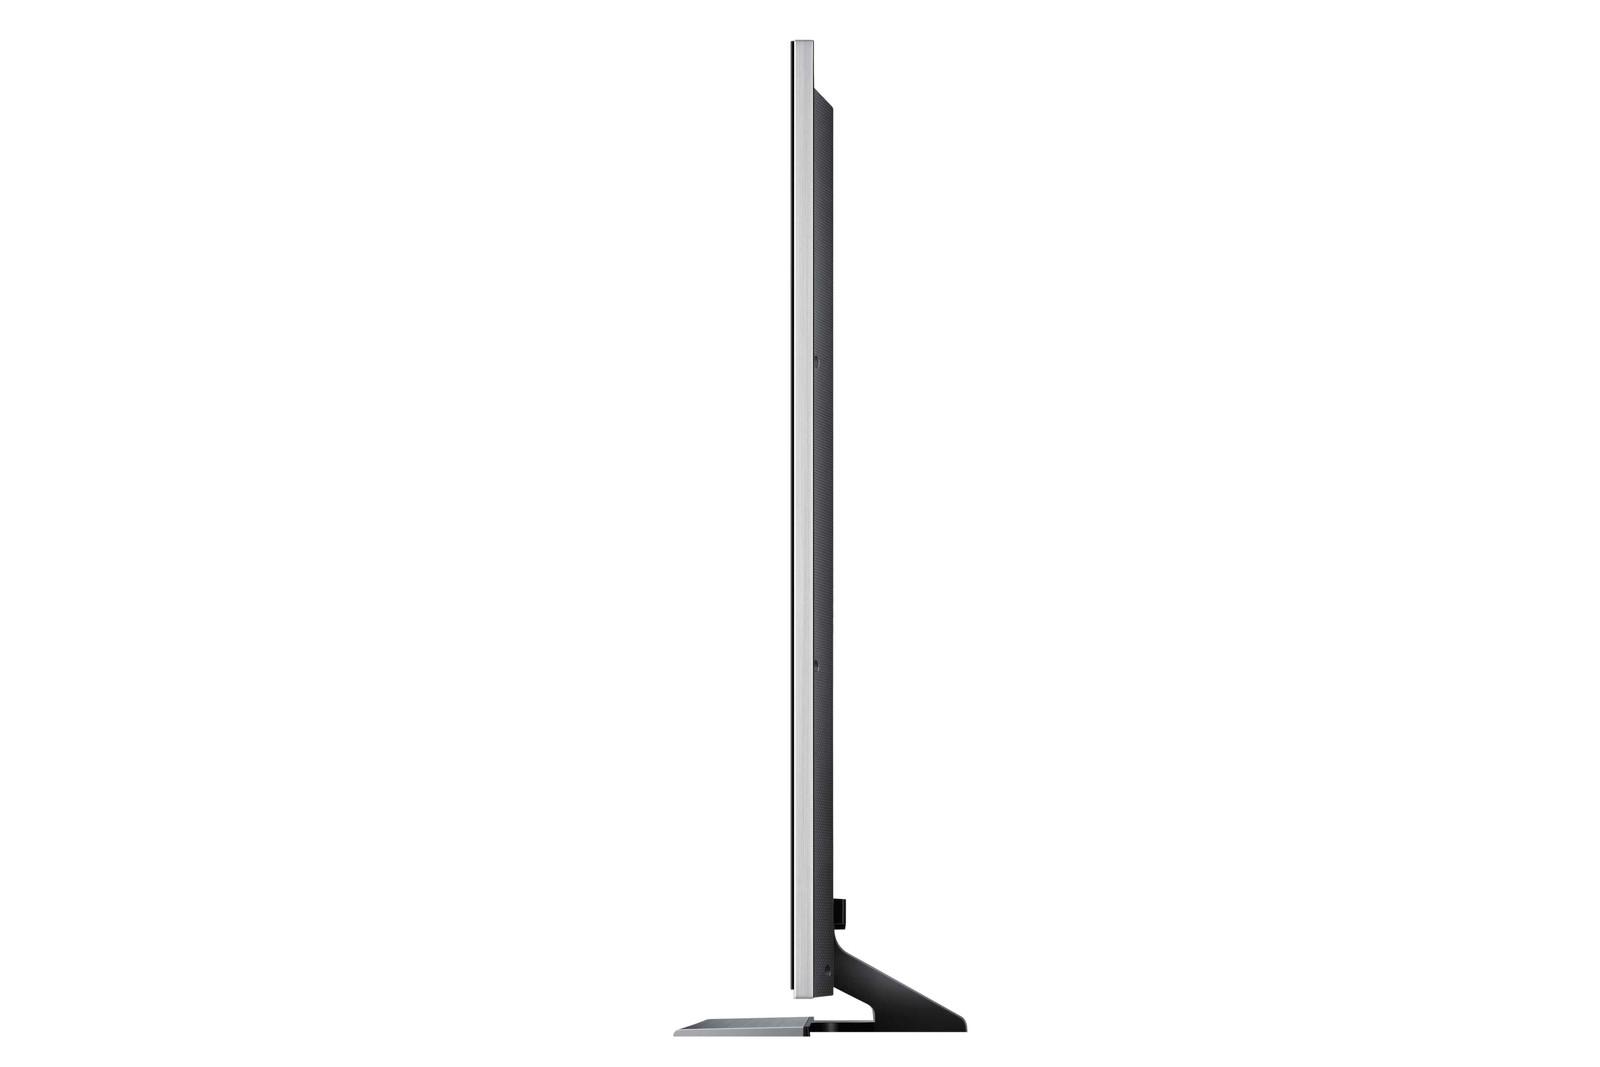 Обзор 75-дюймового 4K-телевизора Samsung UE75HU7500